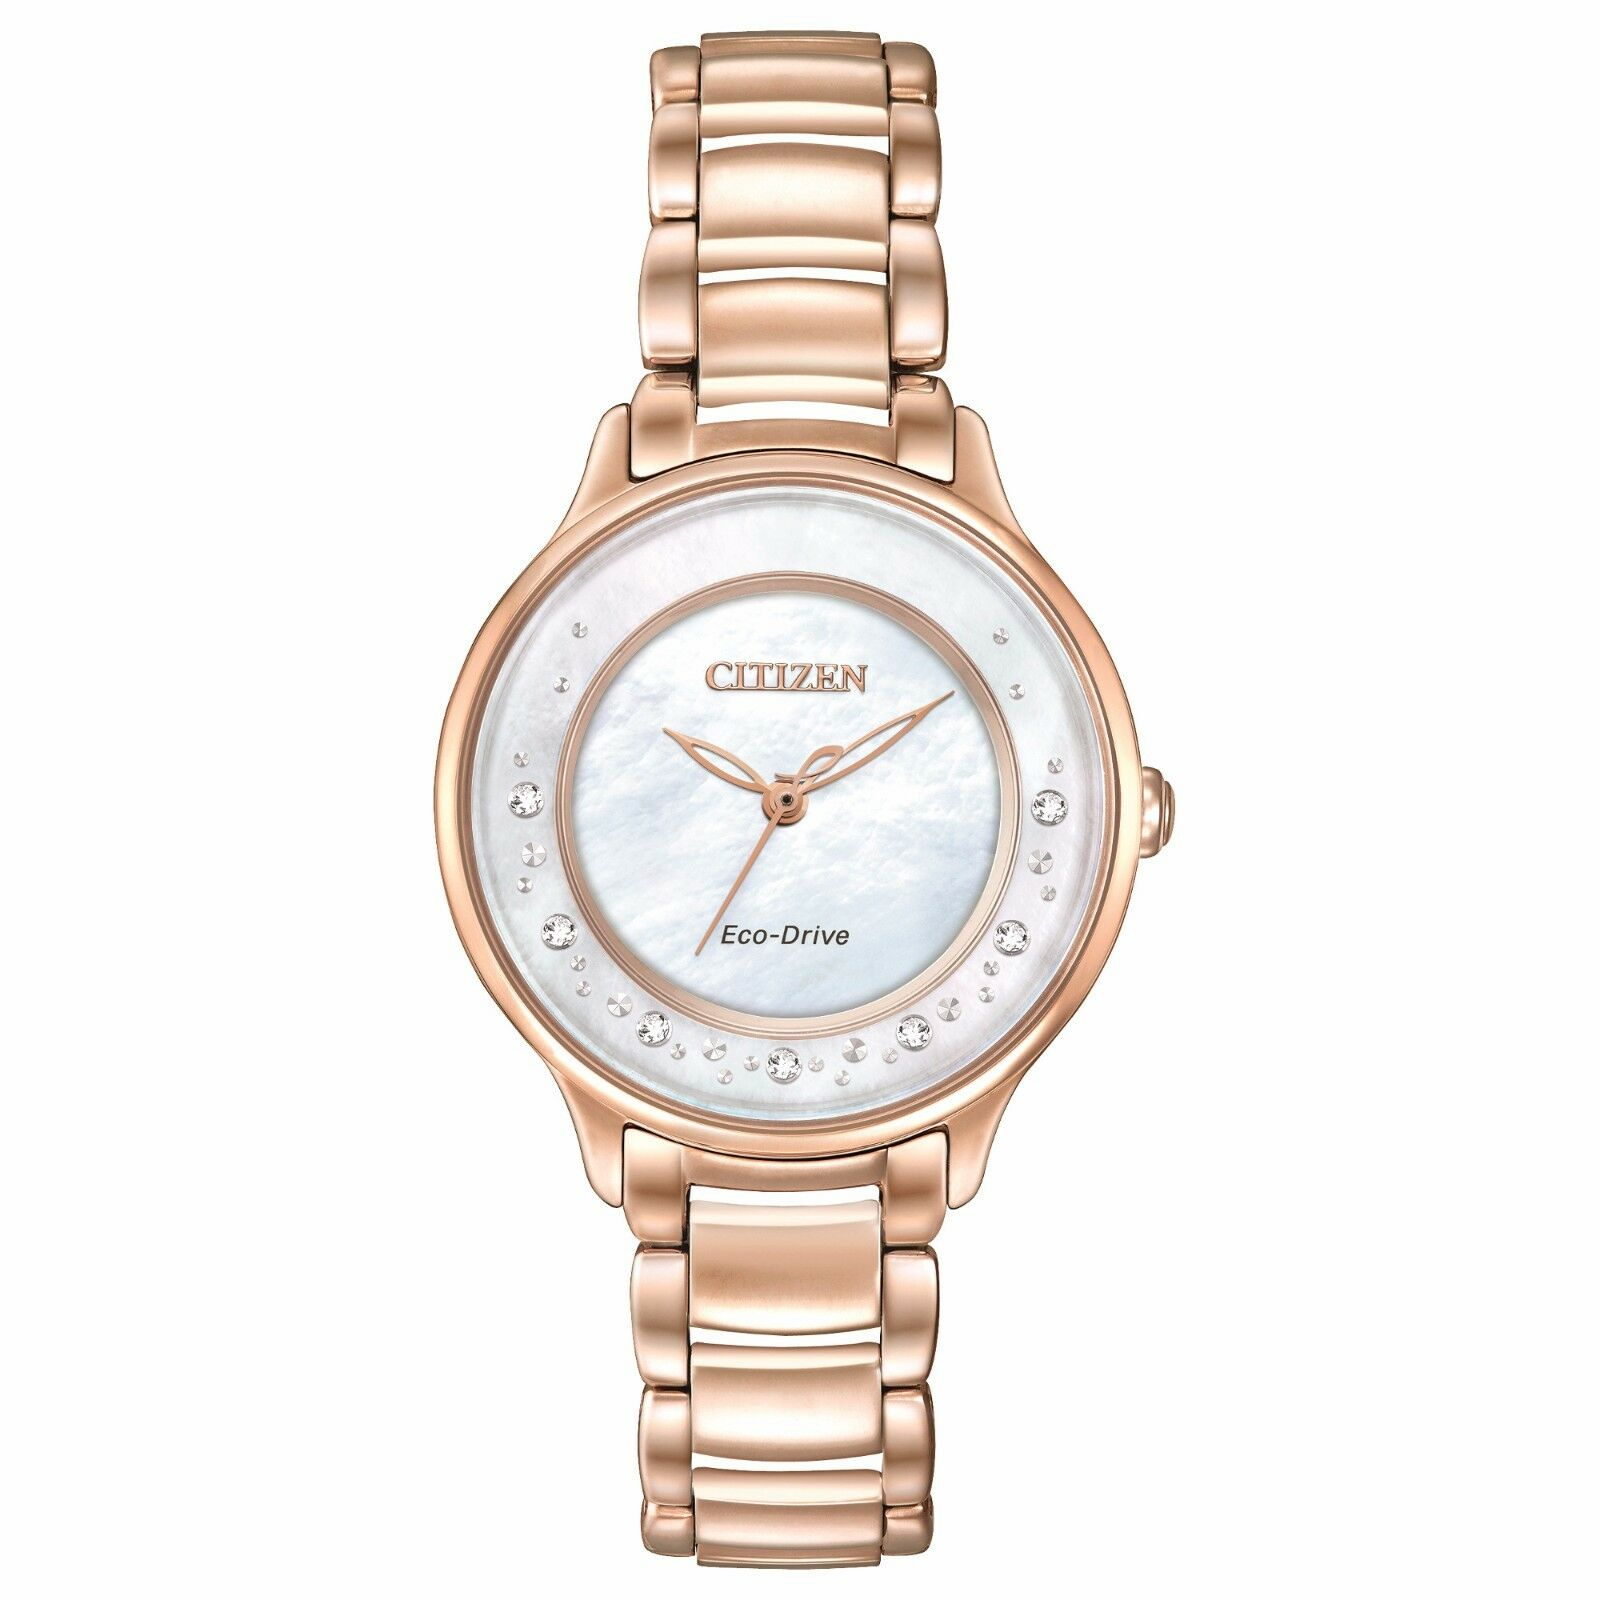 Details about Citizen Eco-Drive Women s EM0382-86D Diamond Markers Rose Gold  Dress 30mm Watch 75c6411f08